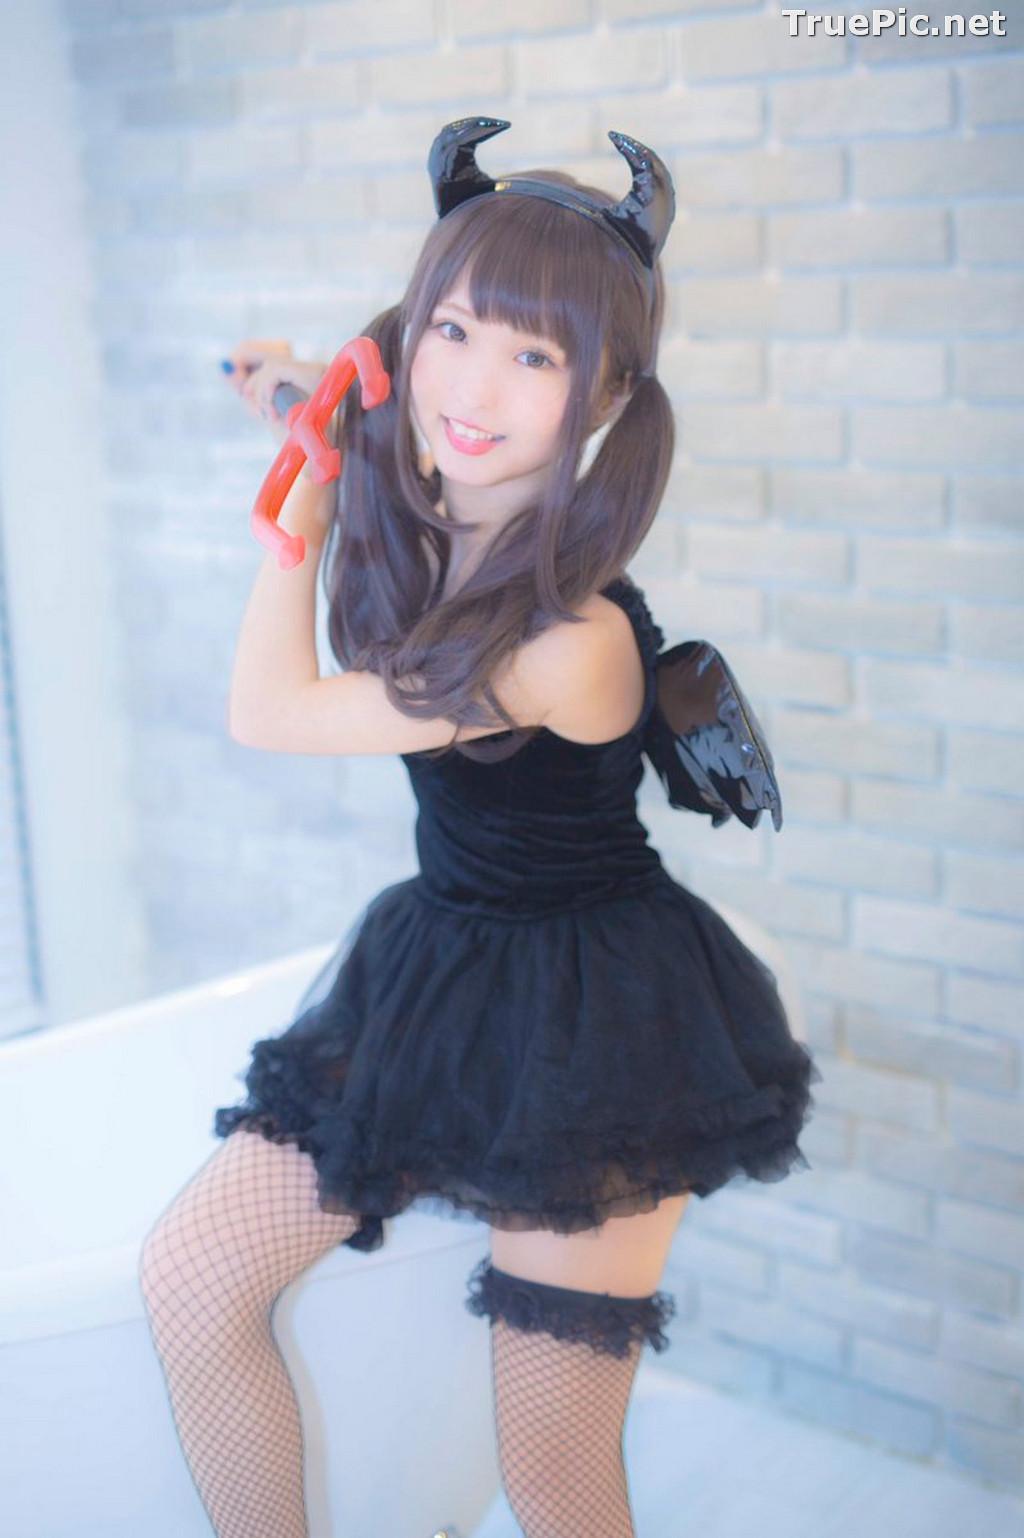 Image Japanese Model - Ennui Mamefu - Cute Cosplay Girl - TruePic.net - Picture-4